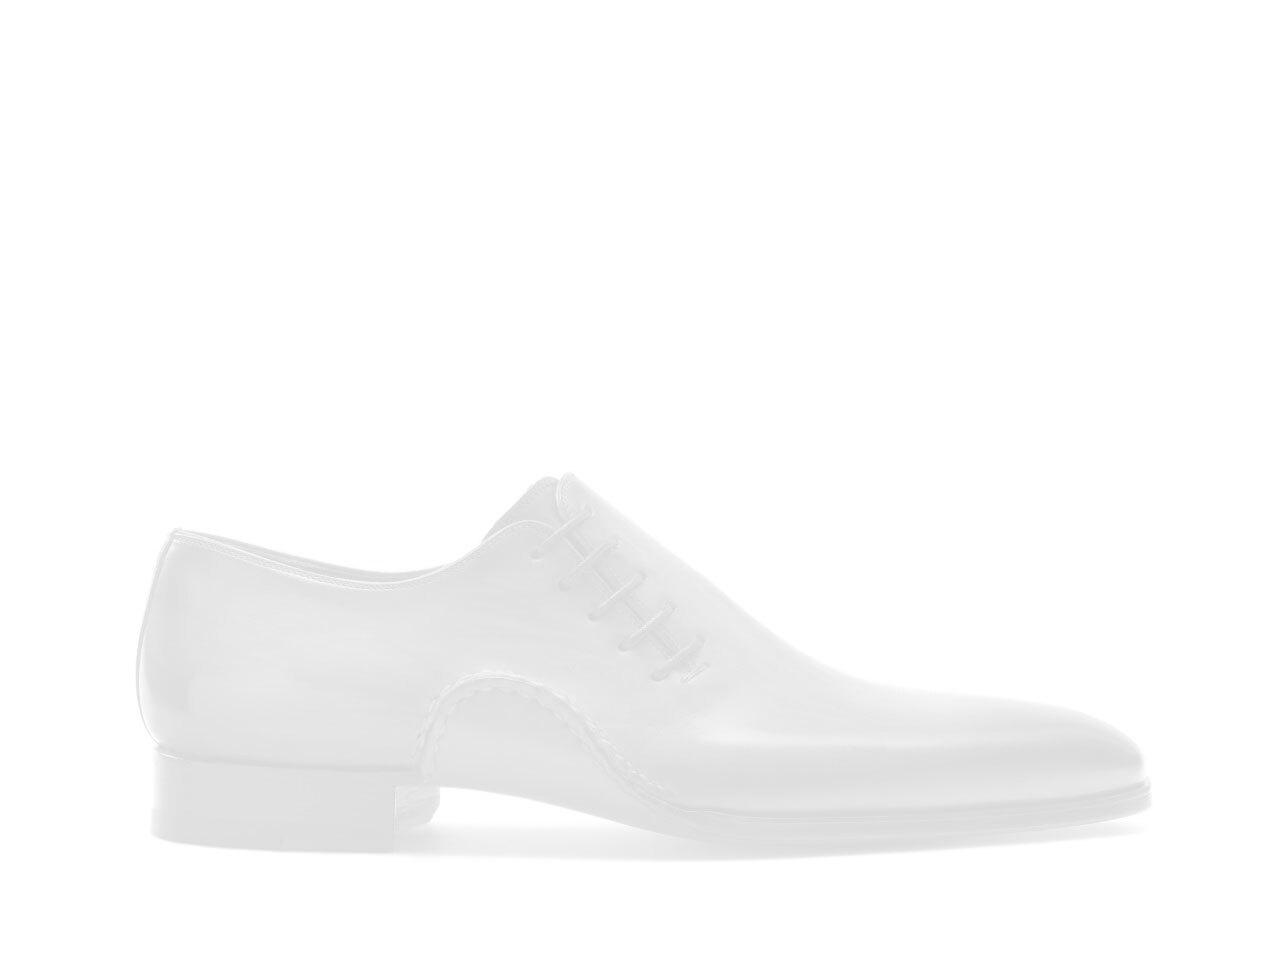 Sole of the Magnanni Echo Lo Grey Men's Sneakers